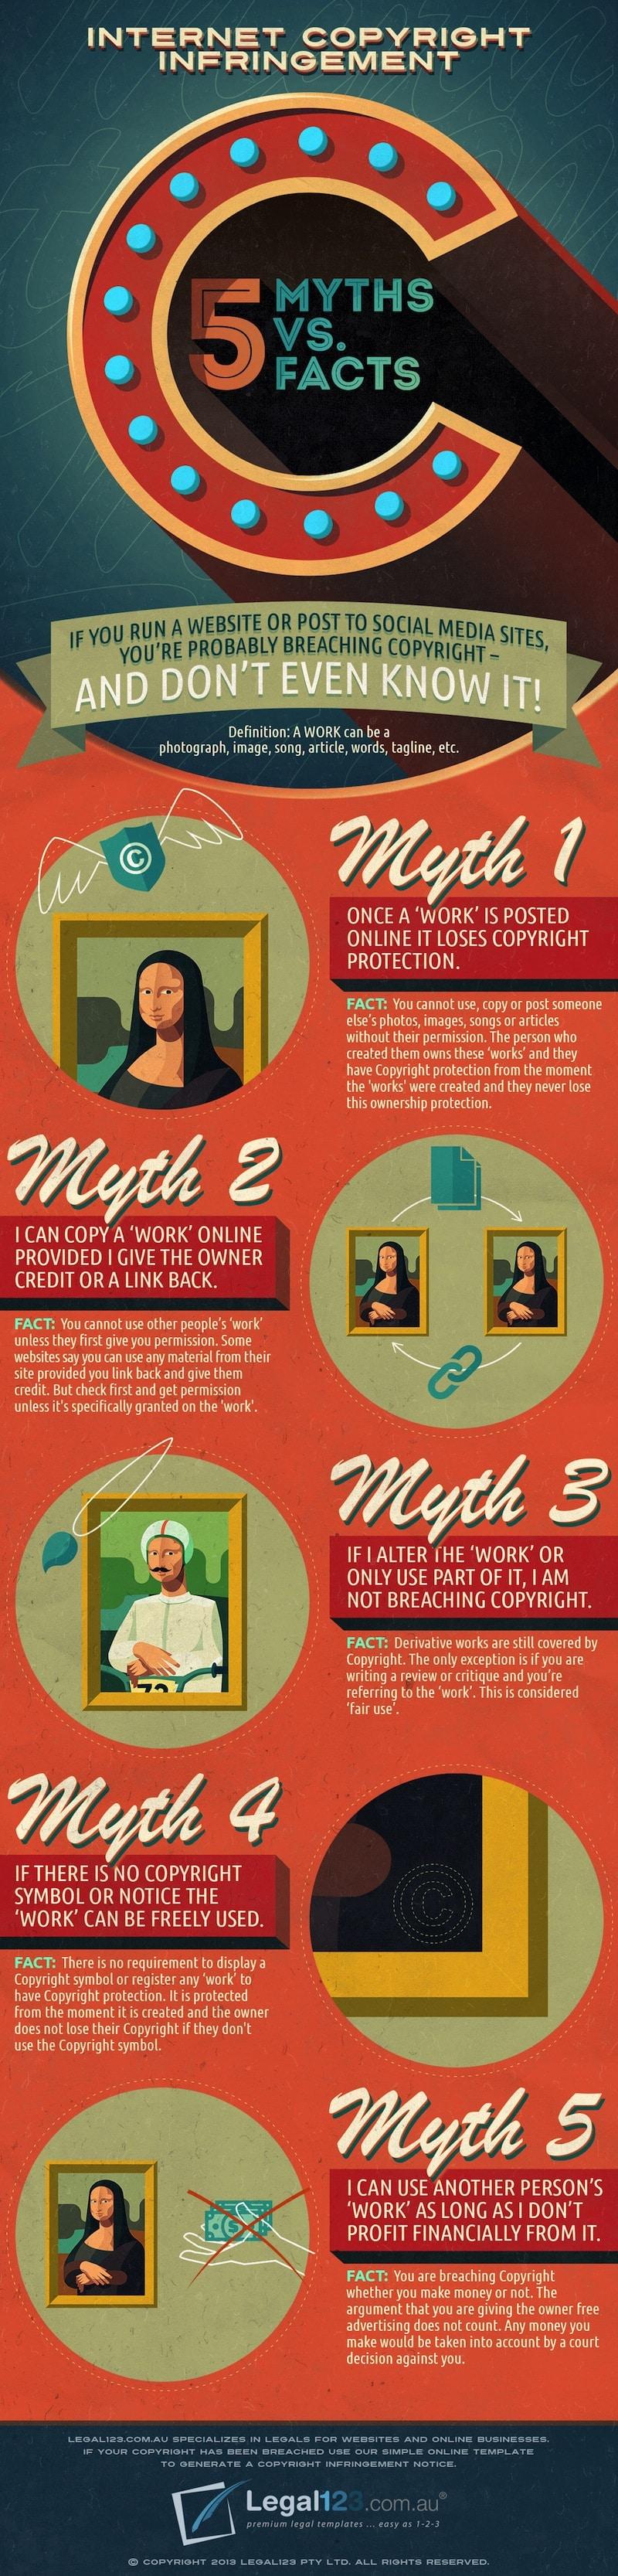 copyright infringement infographic